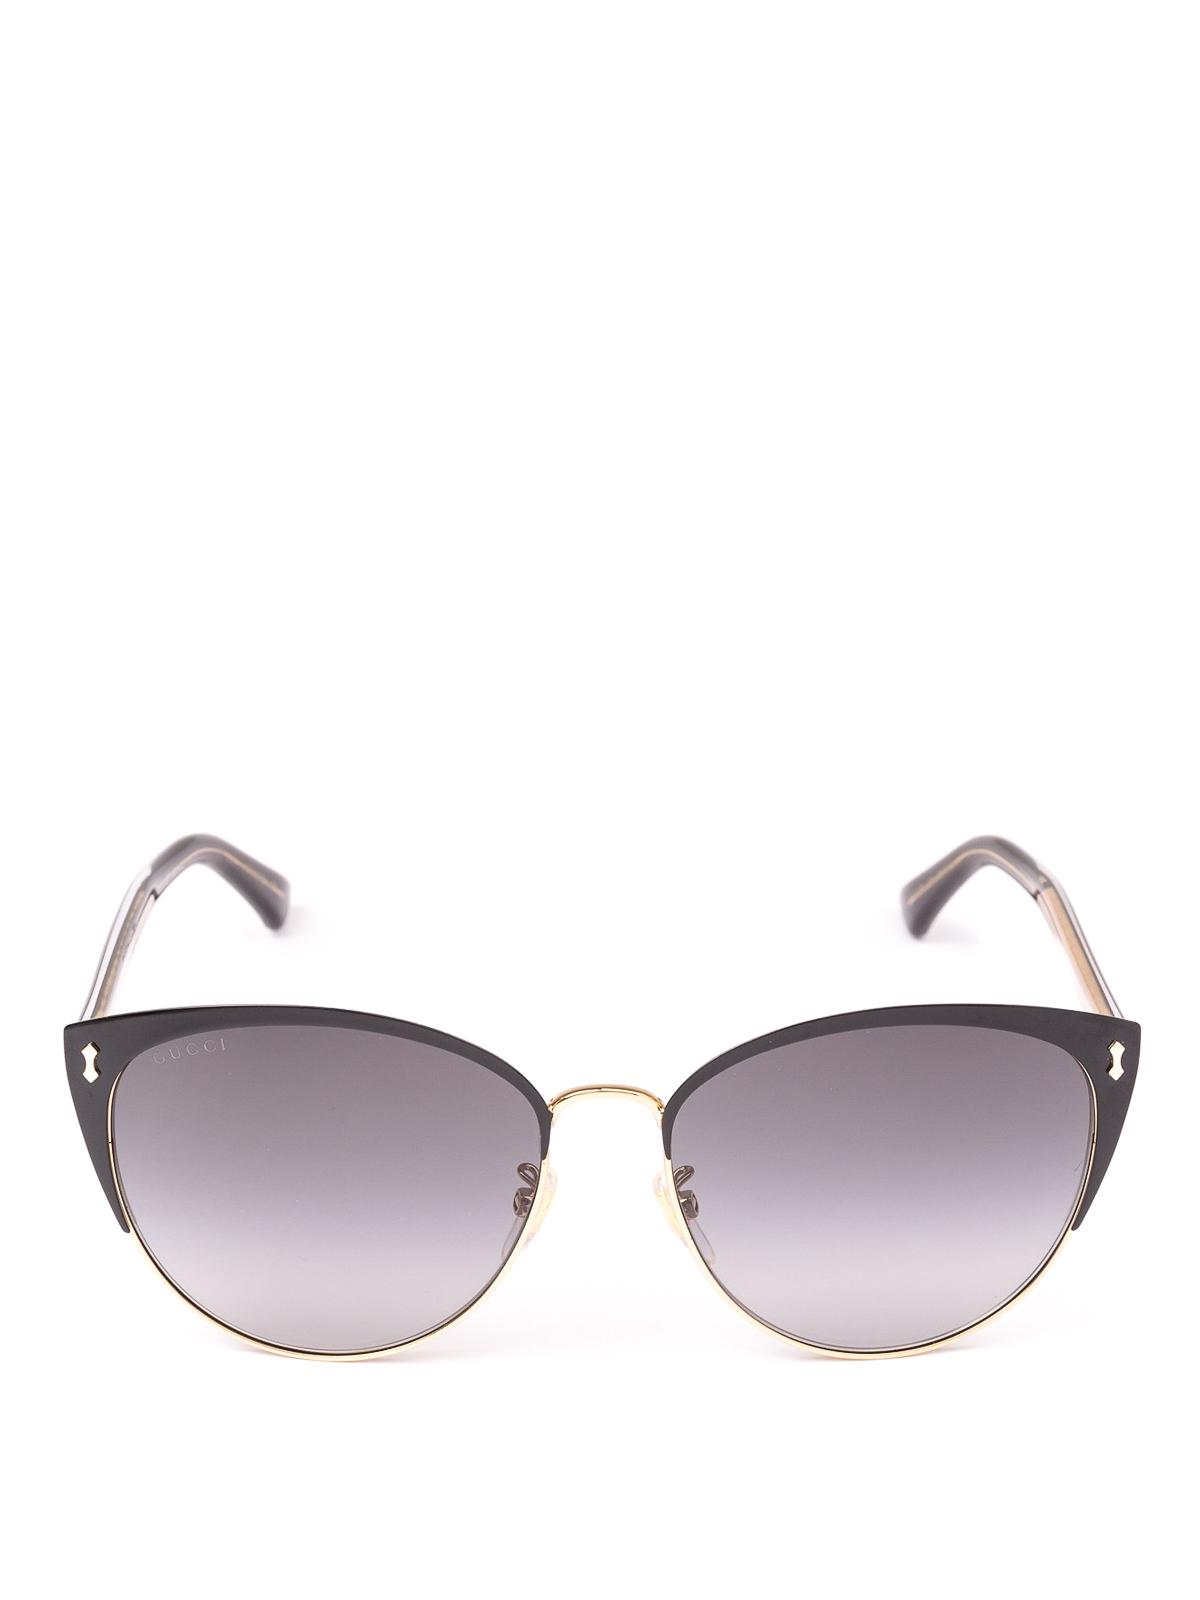 9e5c21a9d14 GUCCI  sunglasses online - Black and gold metal frame cat eye sunglasses